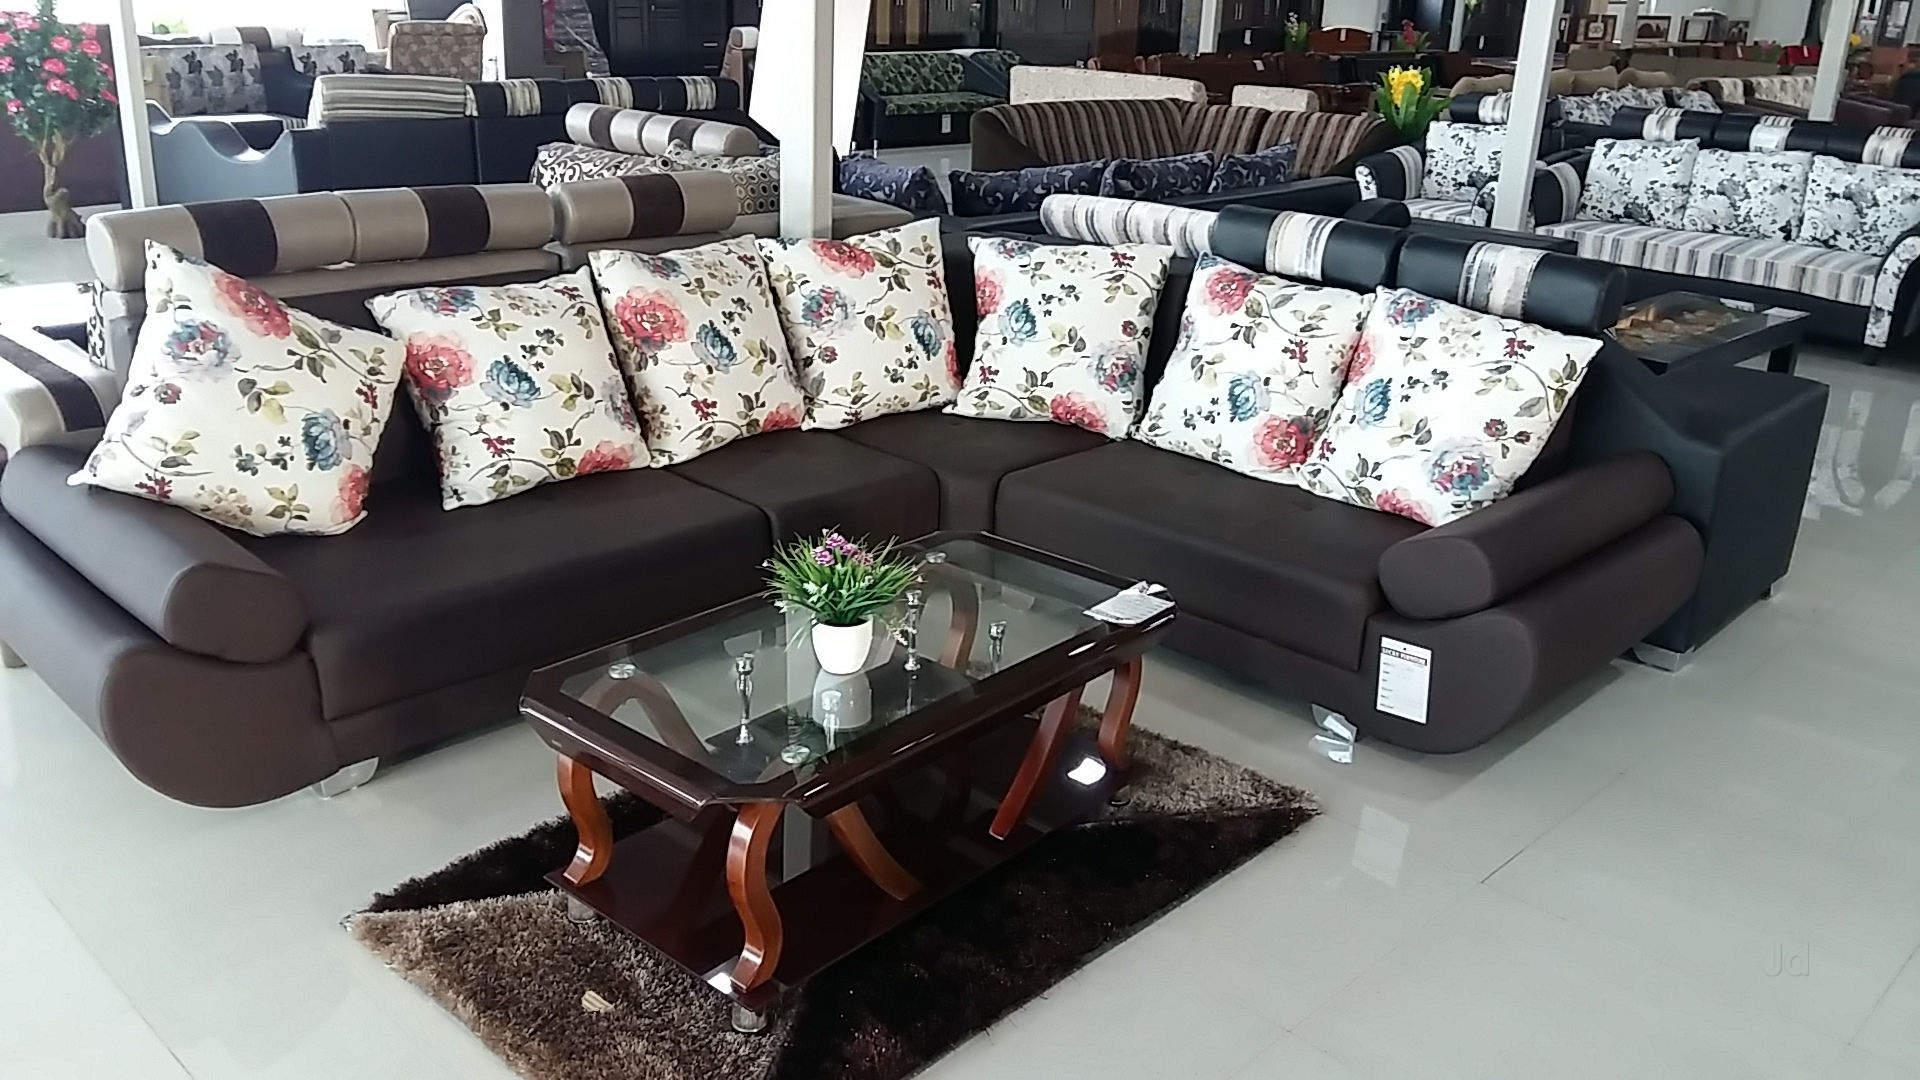 Top 100 Furniture Stores In Kolhapur Furniture Shops Justdial